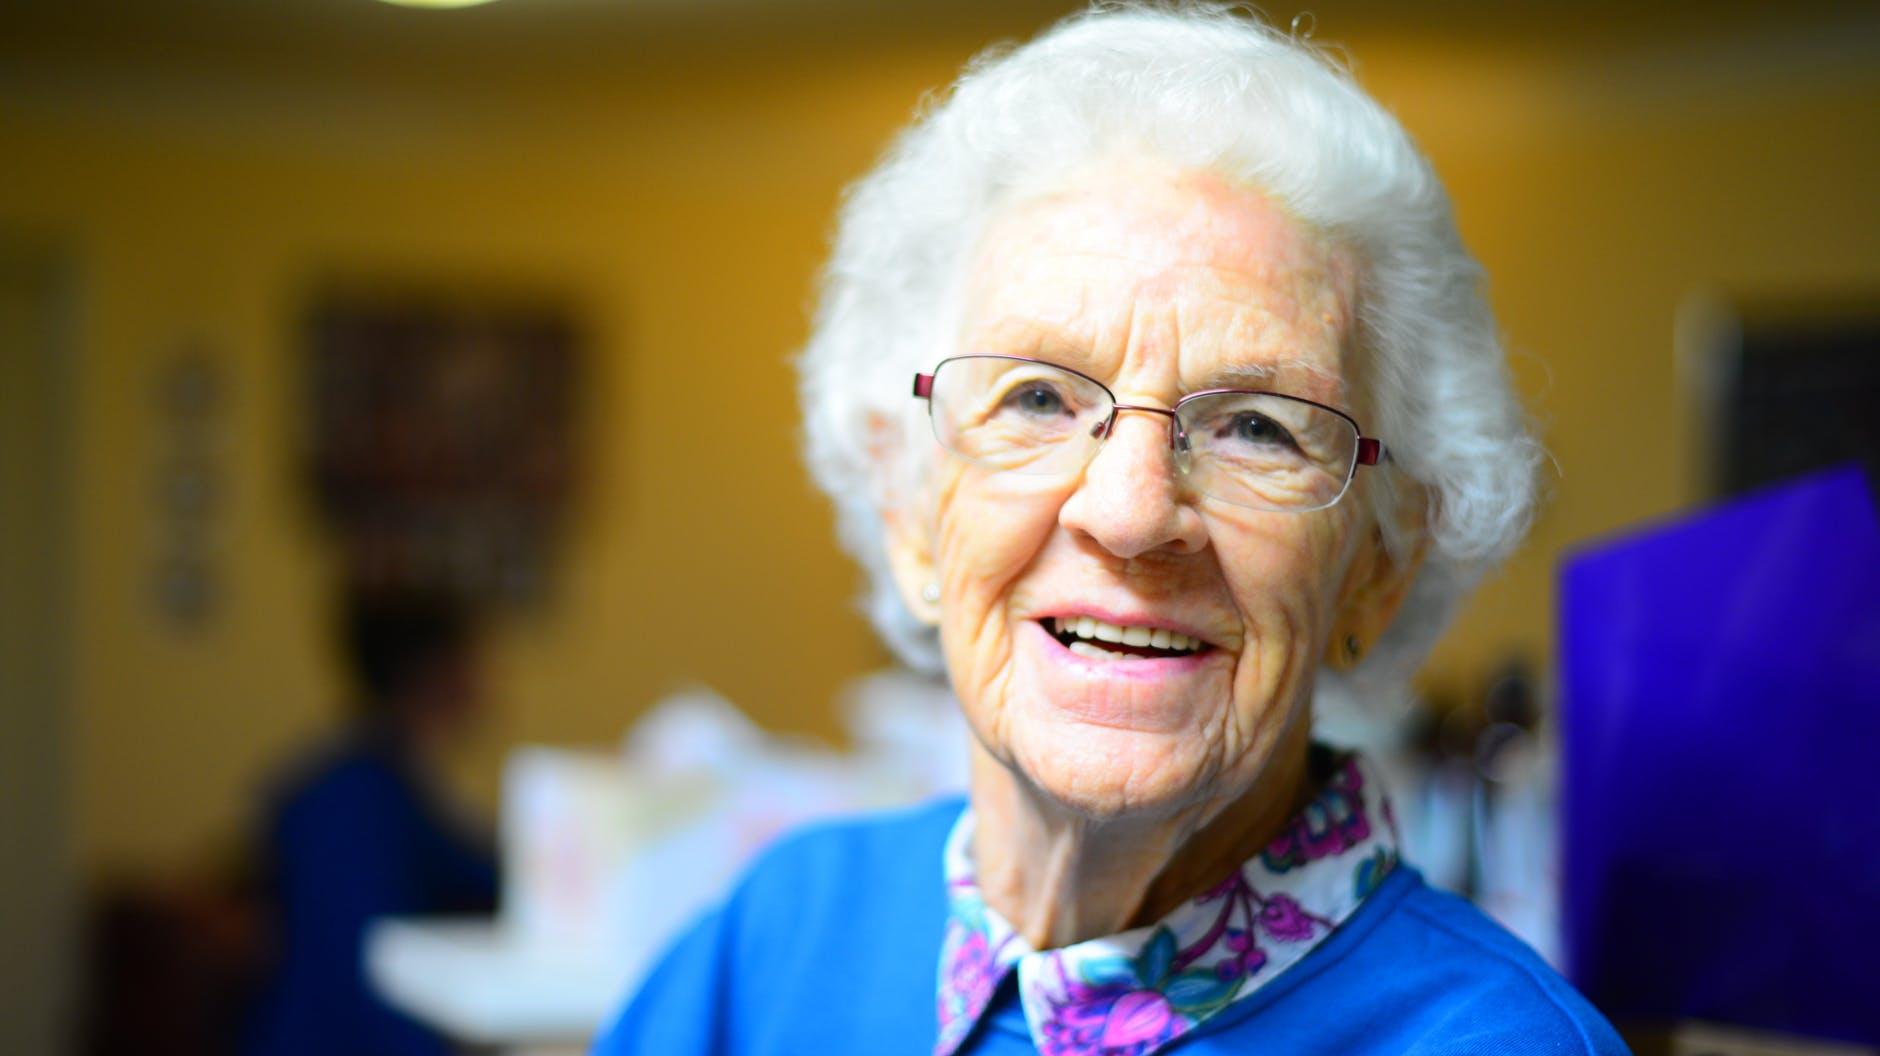 Smiling face of senior woman